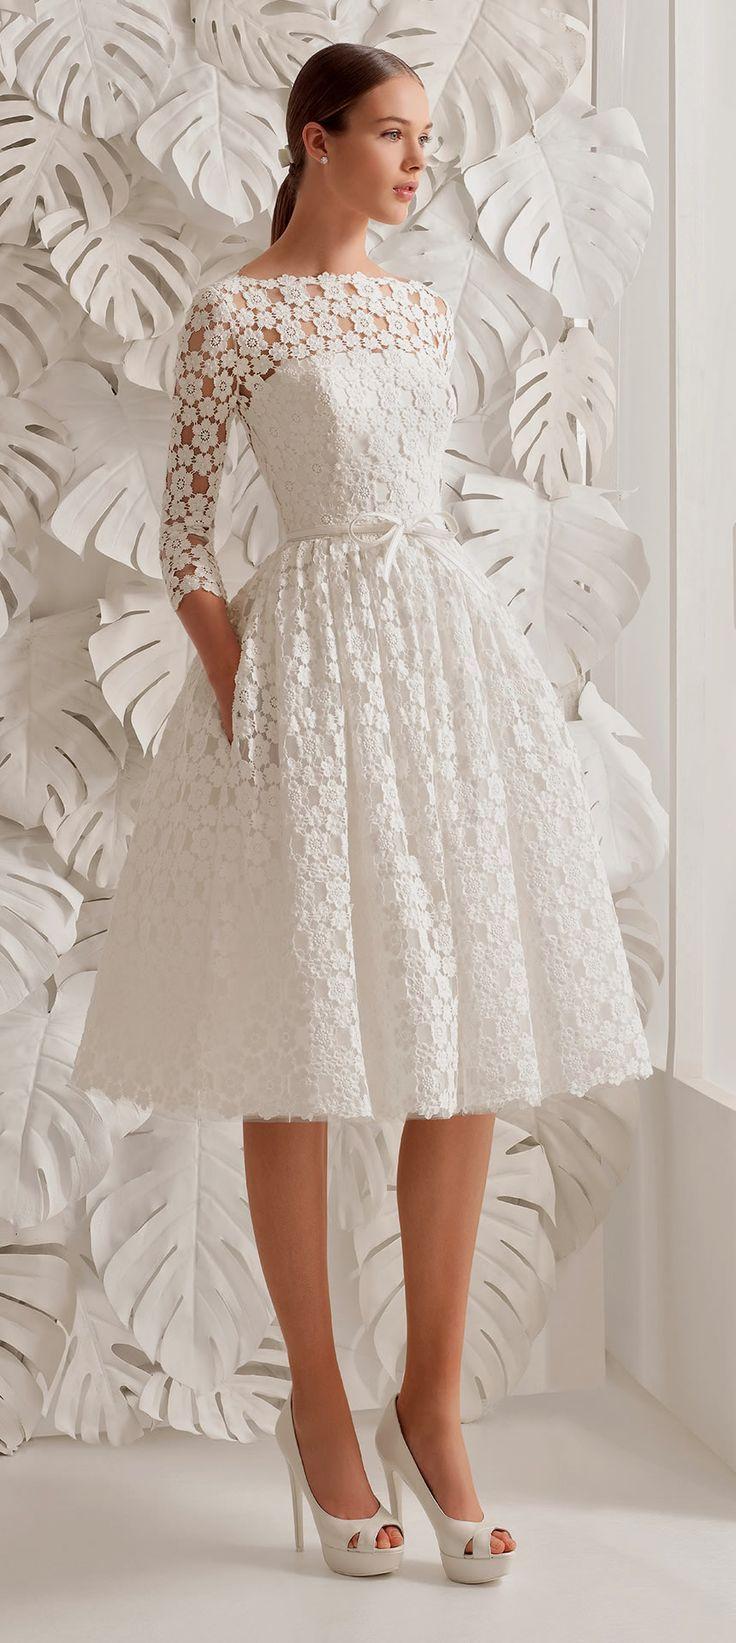 40 Prettiest Rehearsal Dinner Short Wedding Dresses | Short lace ...